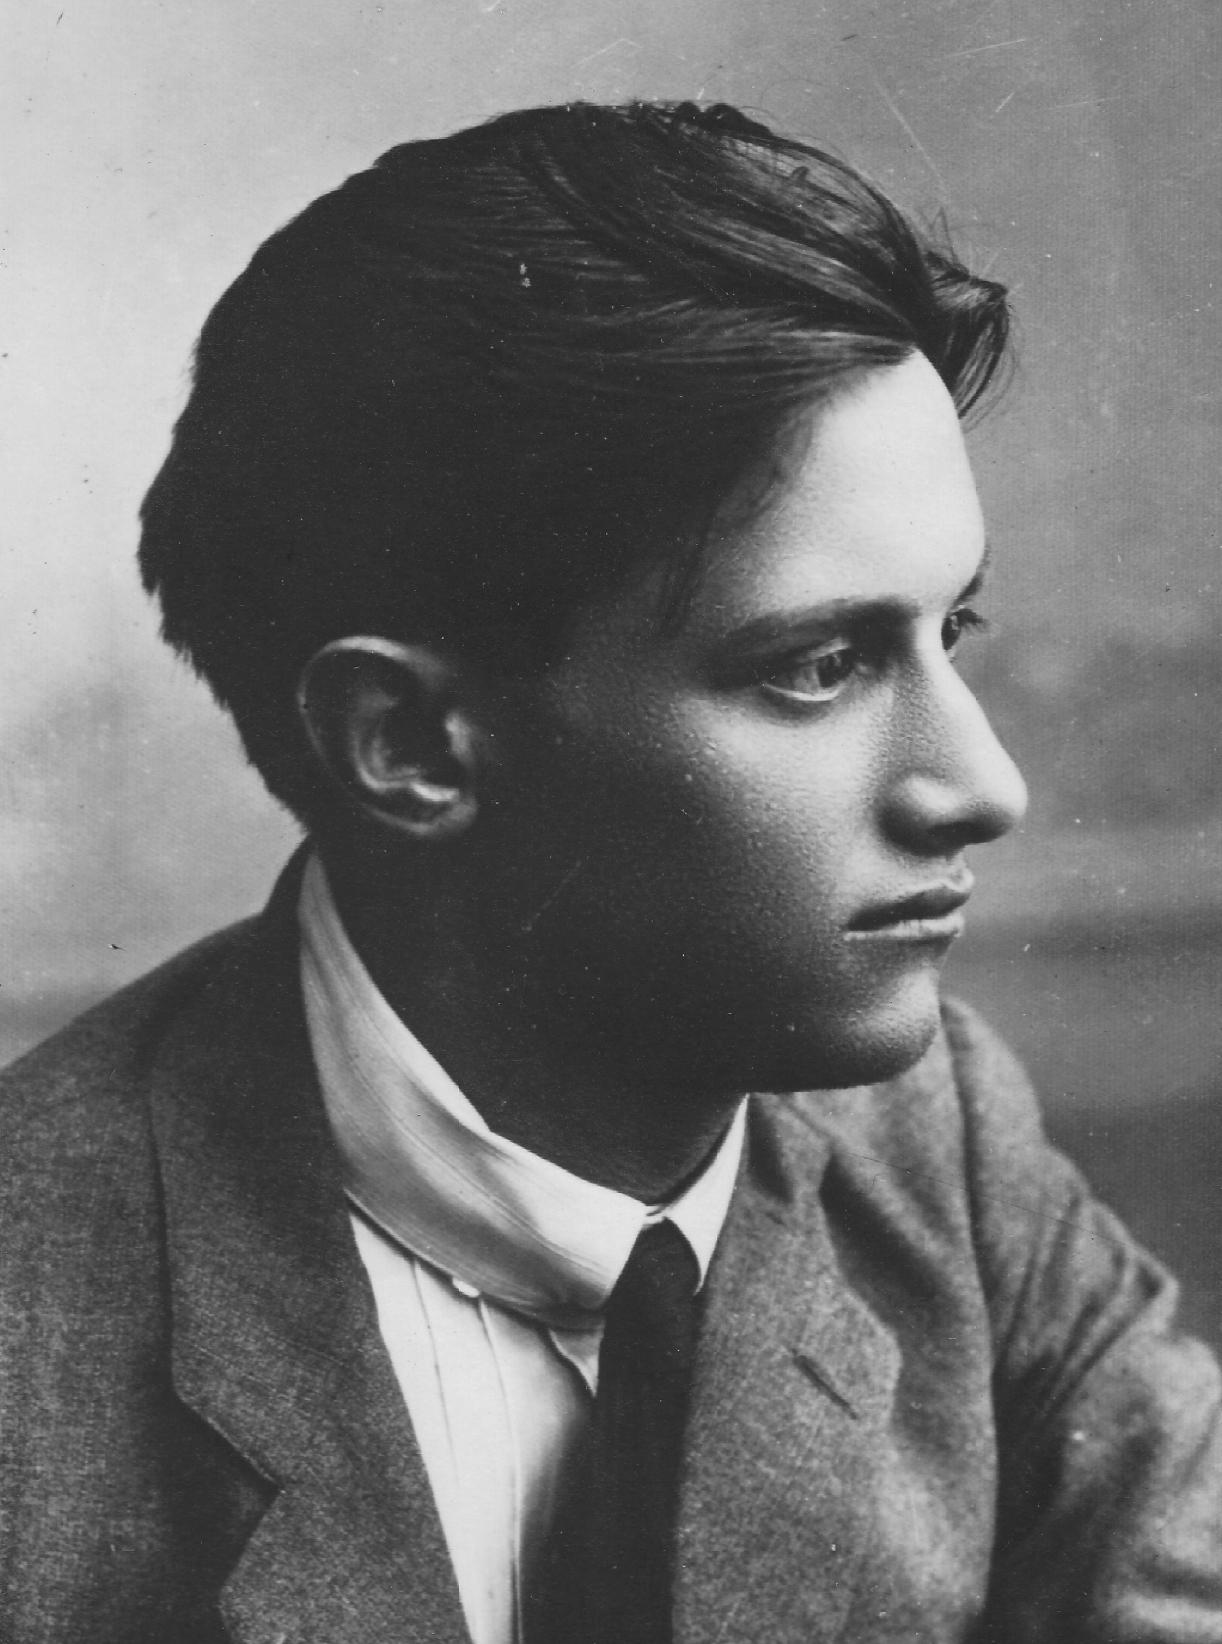 Avshalom Feinberg in Paris before the war